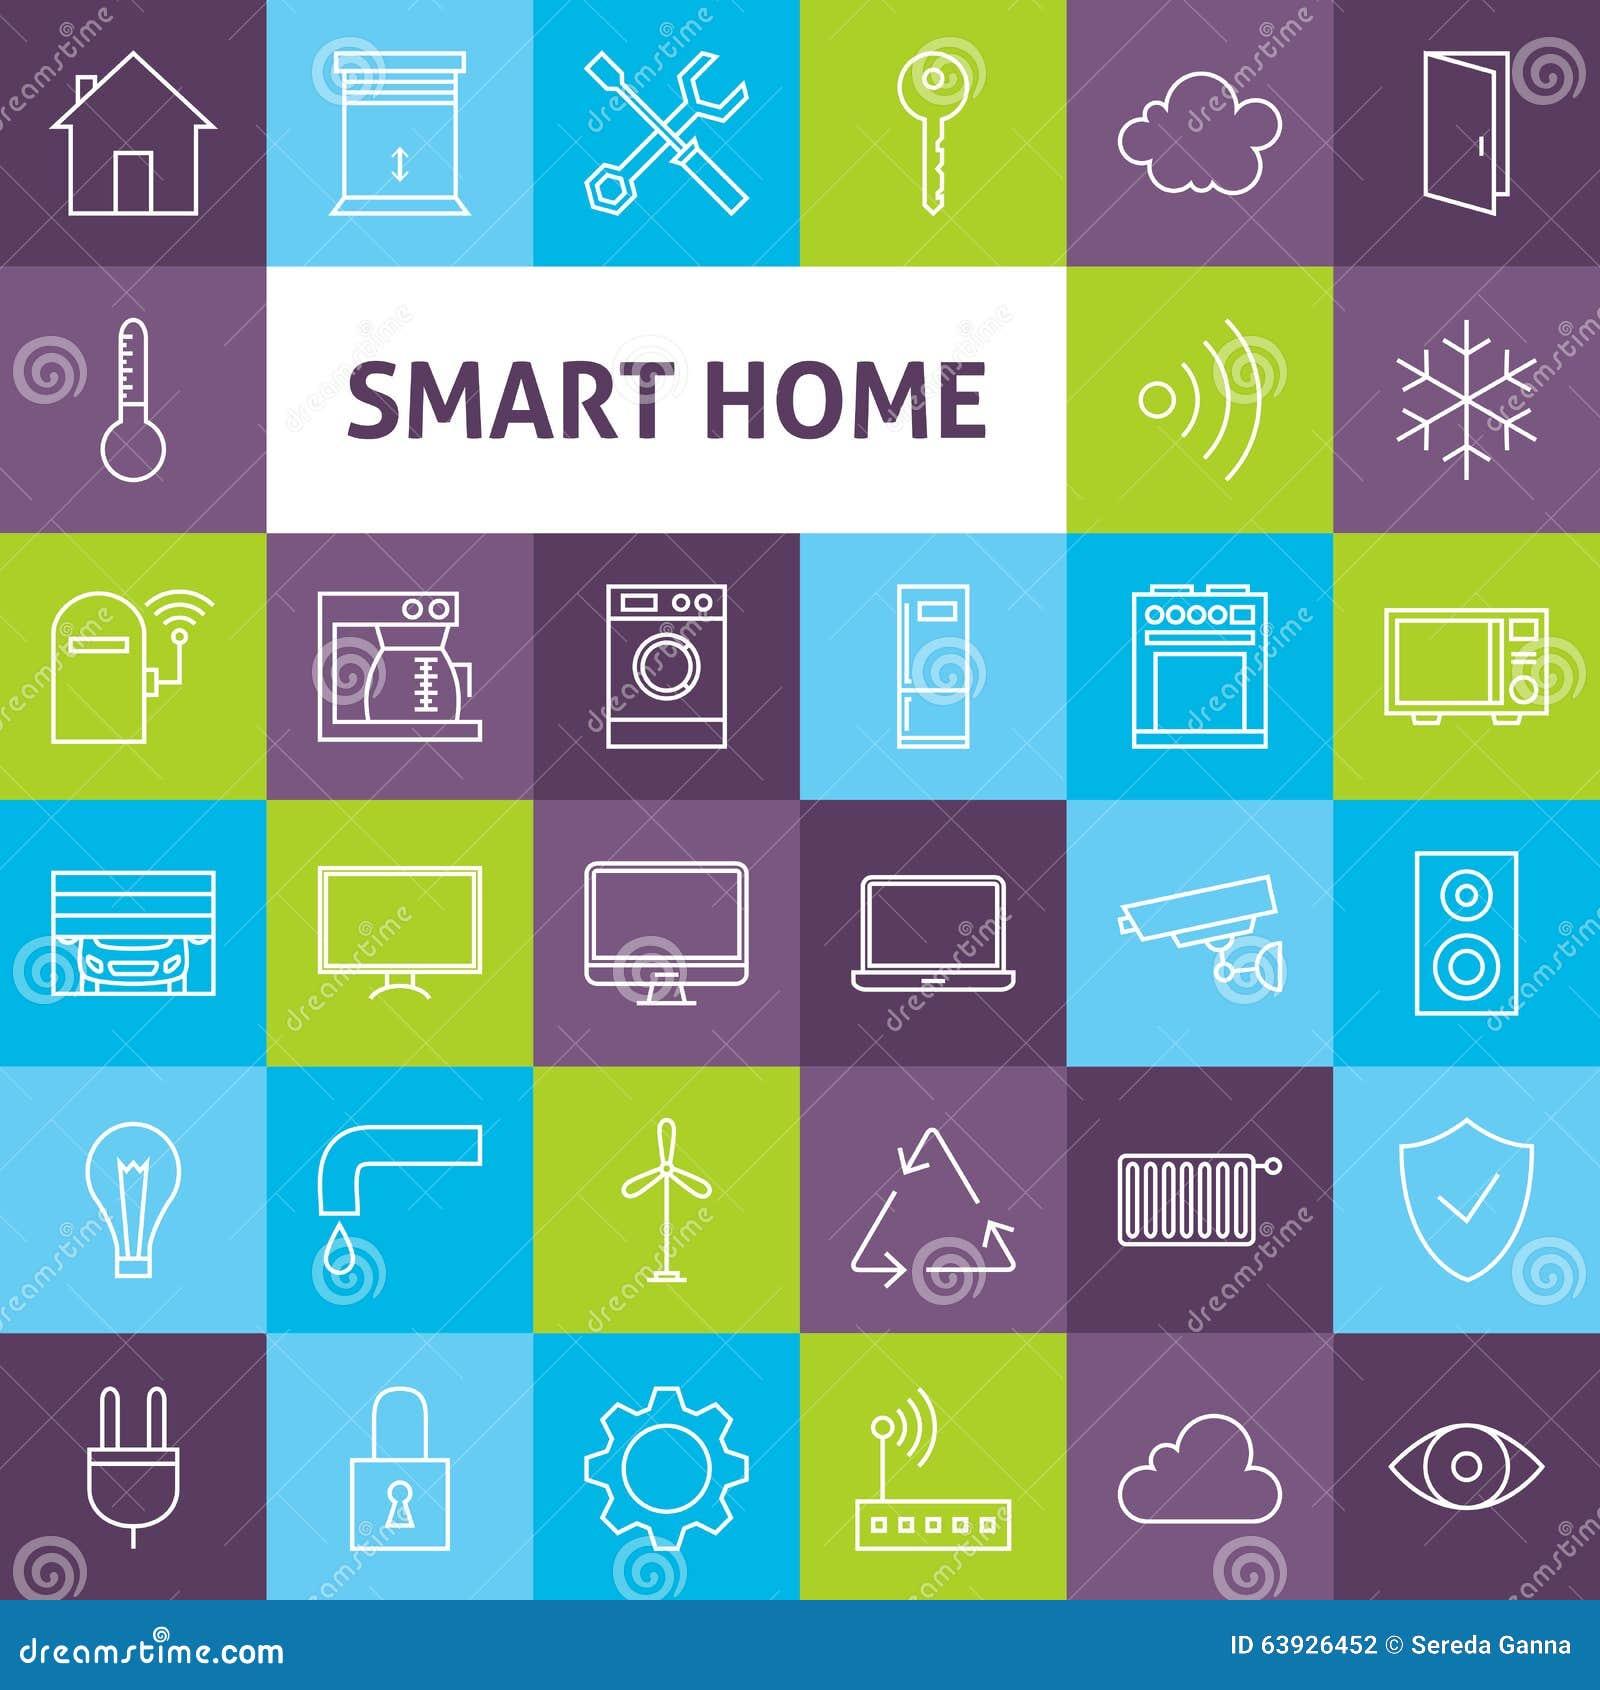 vector line art smart home icons set stock vector image. Black Bedroom Furniture Sets. Home Design Ideas